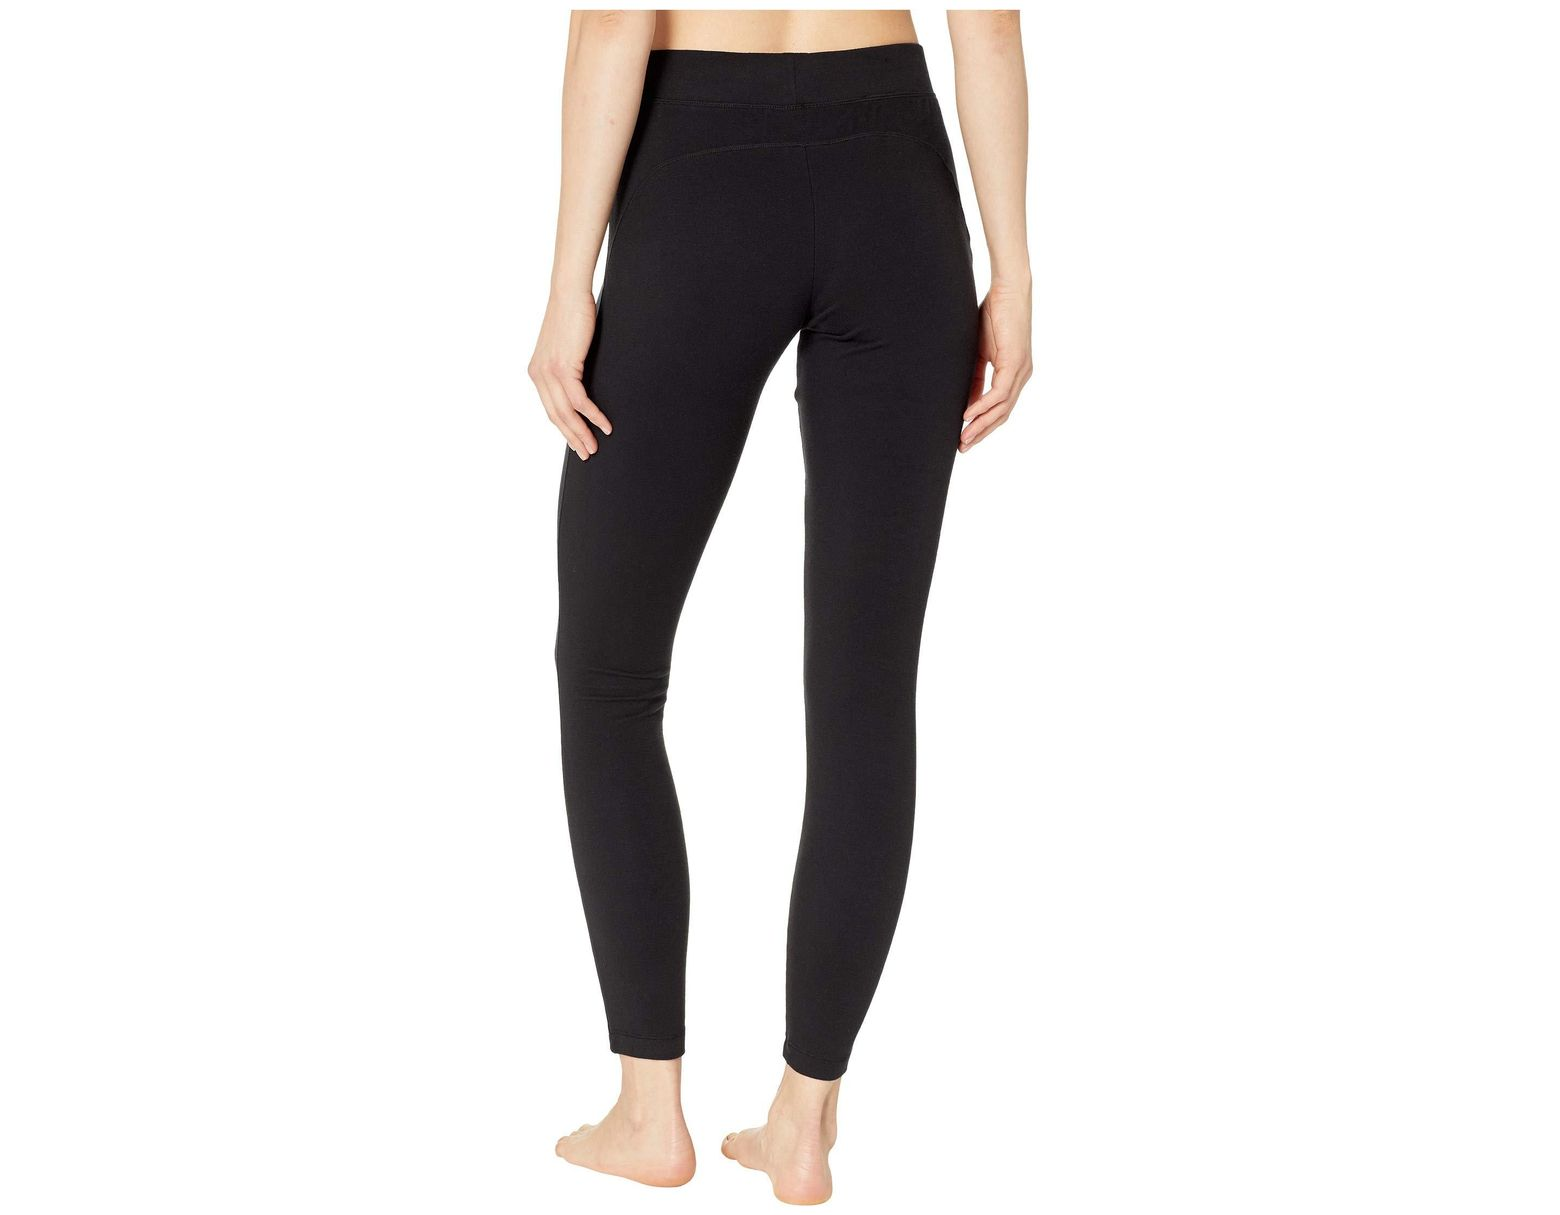 1ad5ed16f82 Lyst - UGG Ashlee Leggings (black) Women's Casual Pants in Black